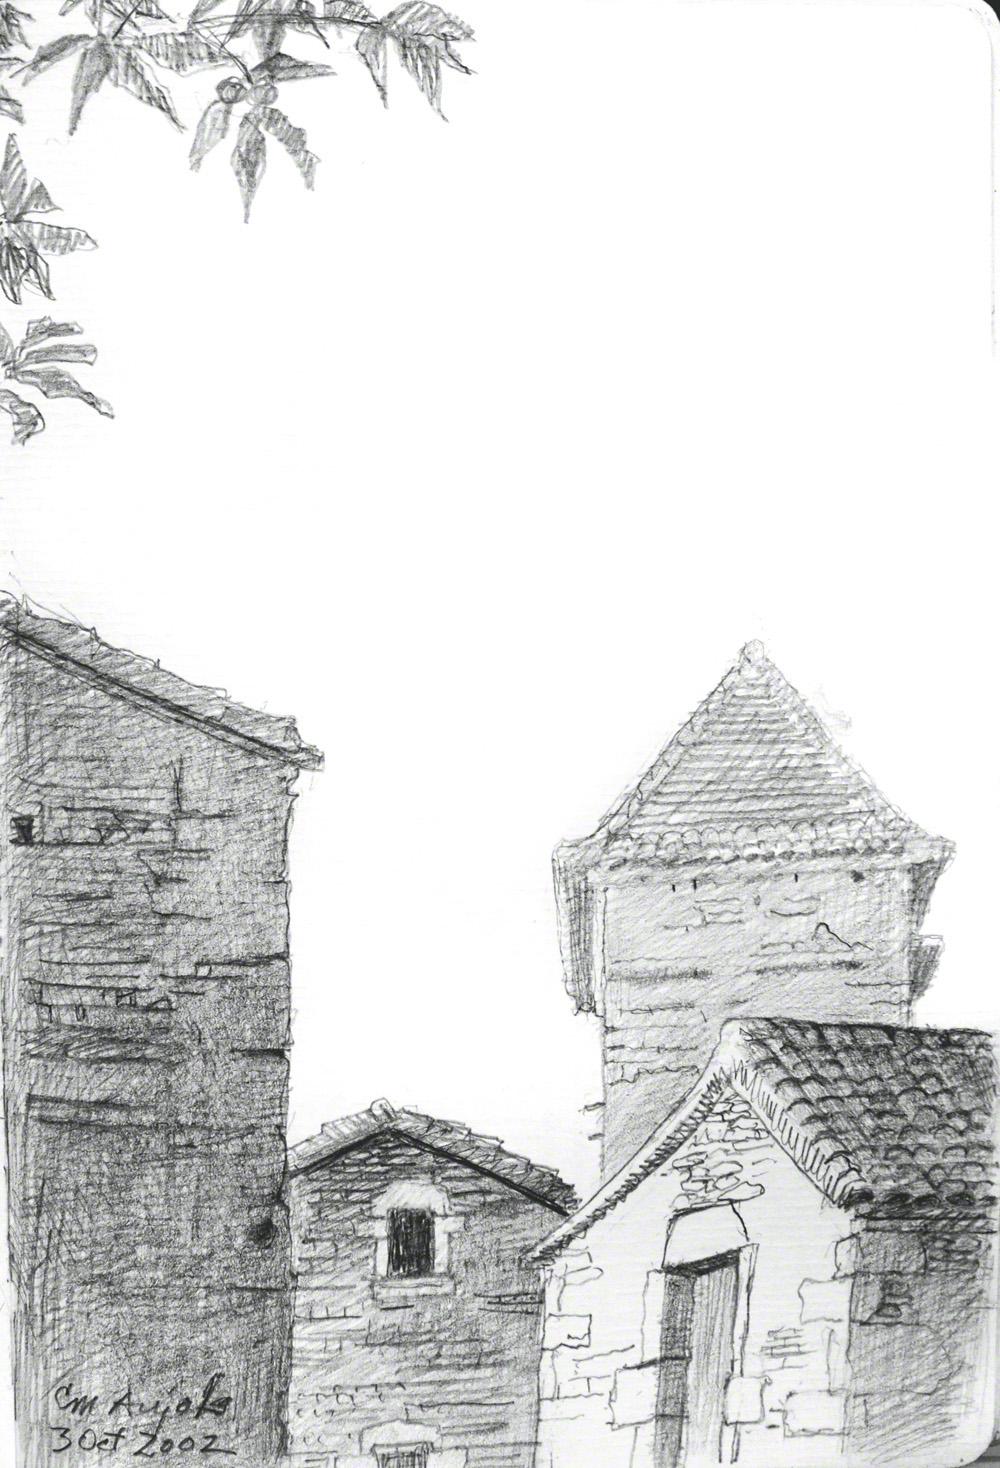 Aujols,  pencil on paper, October, 2002